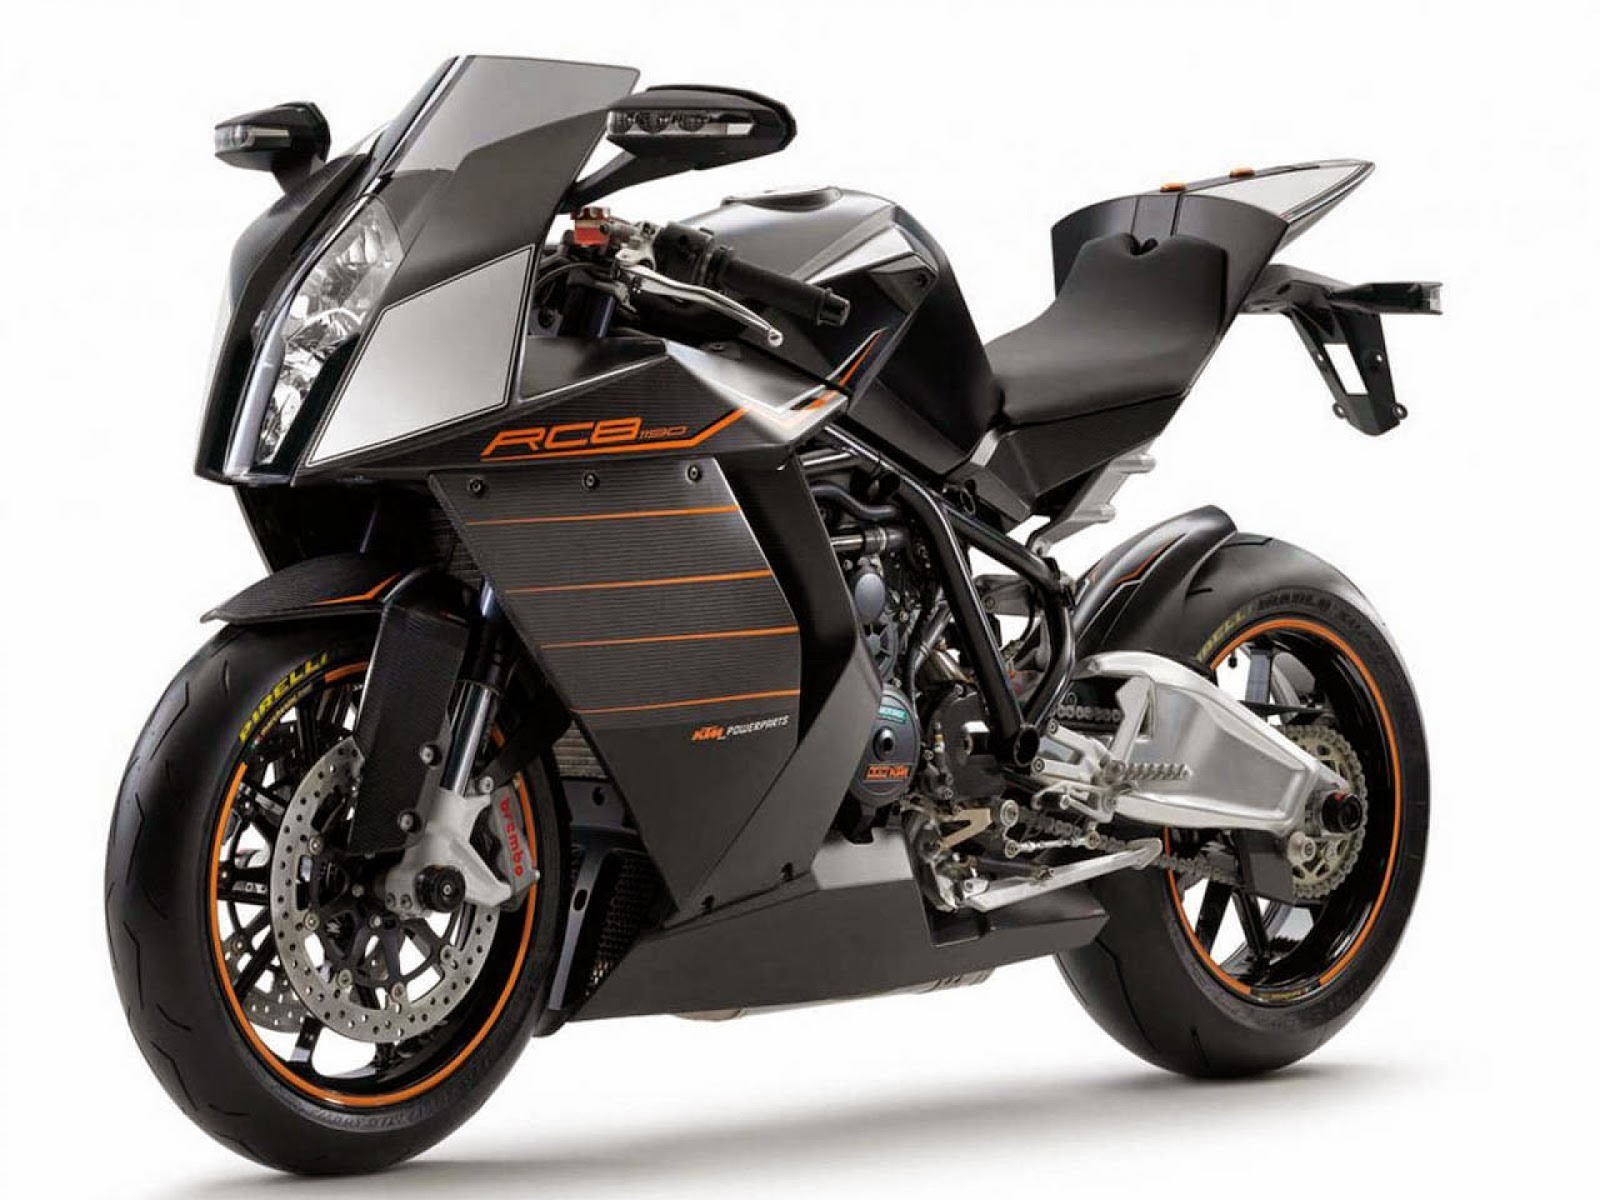 KTM 1190 RC8 R Black Bikes Hd Wallppaers for Desktop